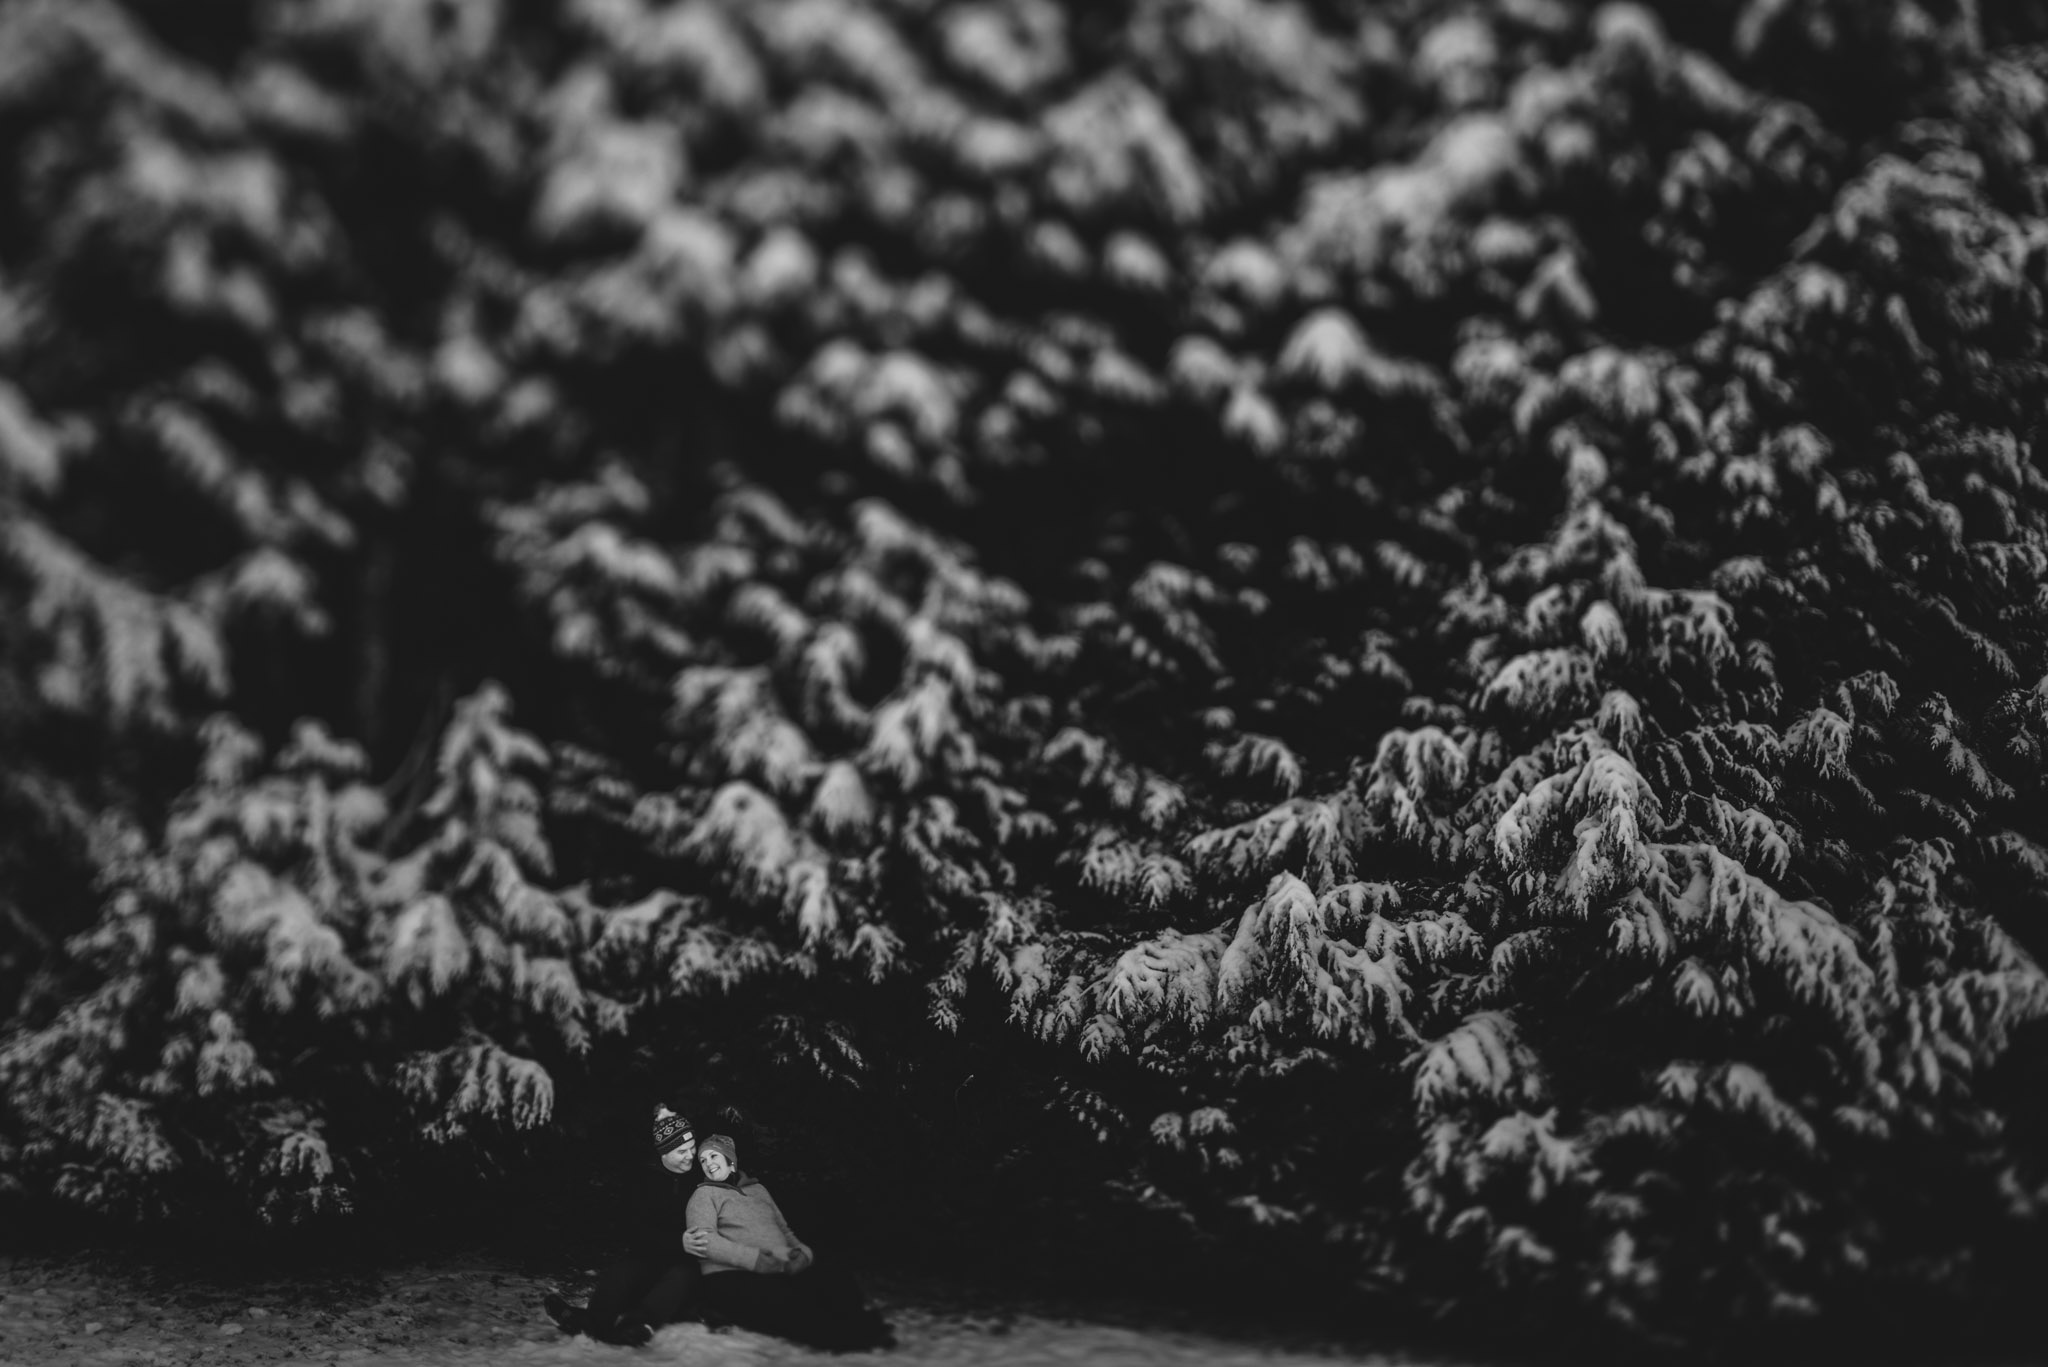 Bryllupsfotograf- stavanger-forlovet-vinterbilder-eirik-halvorsen-18.jpg